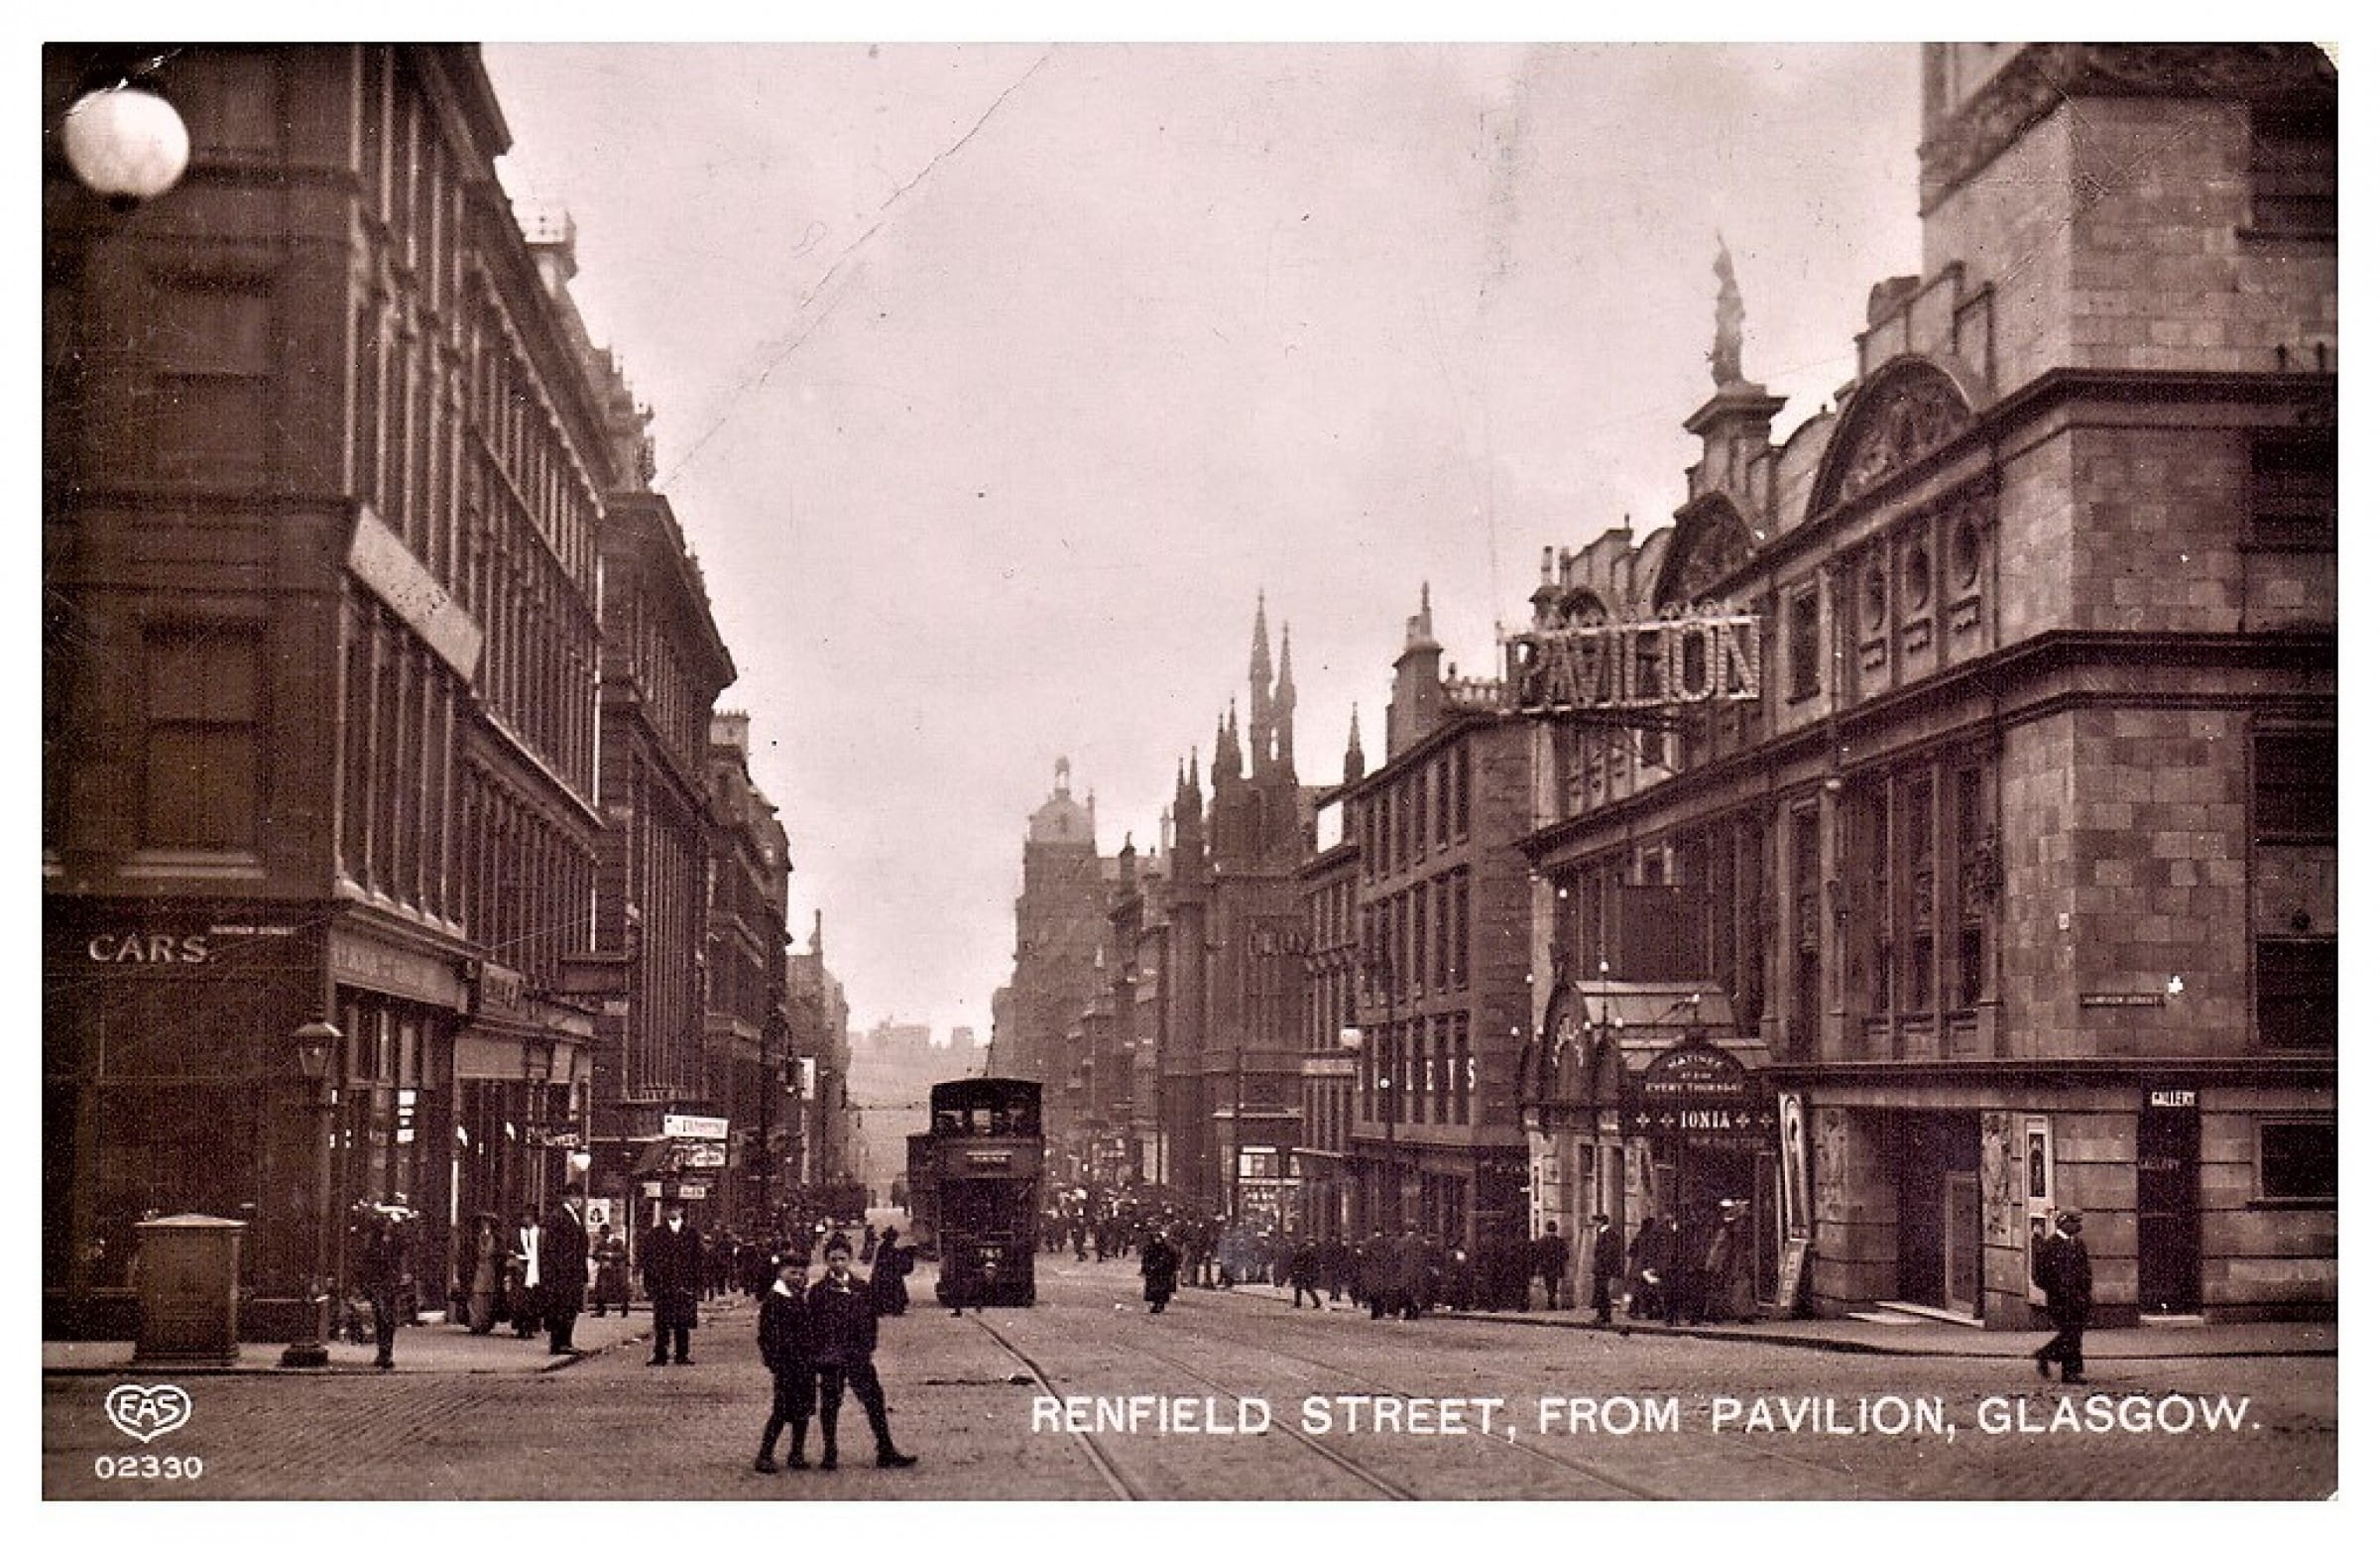 It's all downhill from here... (Renfield Street, from Renfrew Street, circa 1912 (Postcard))